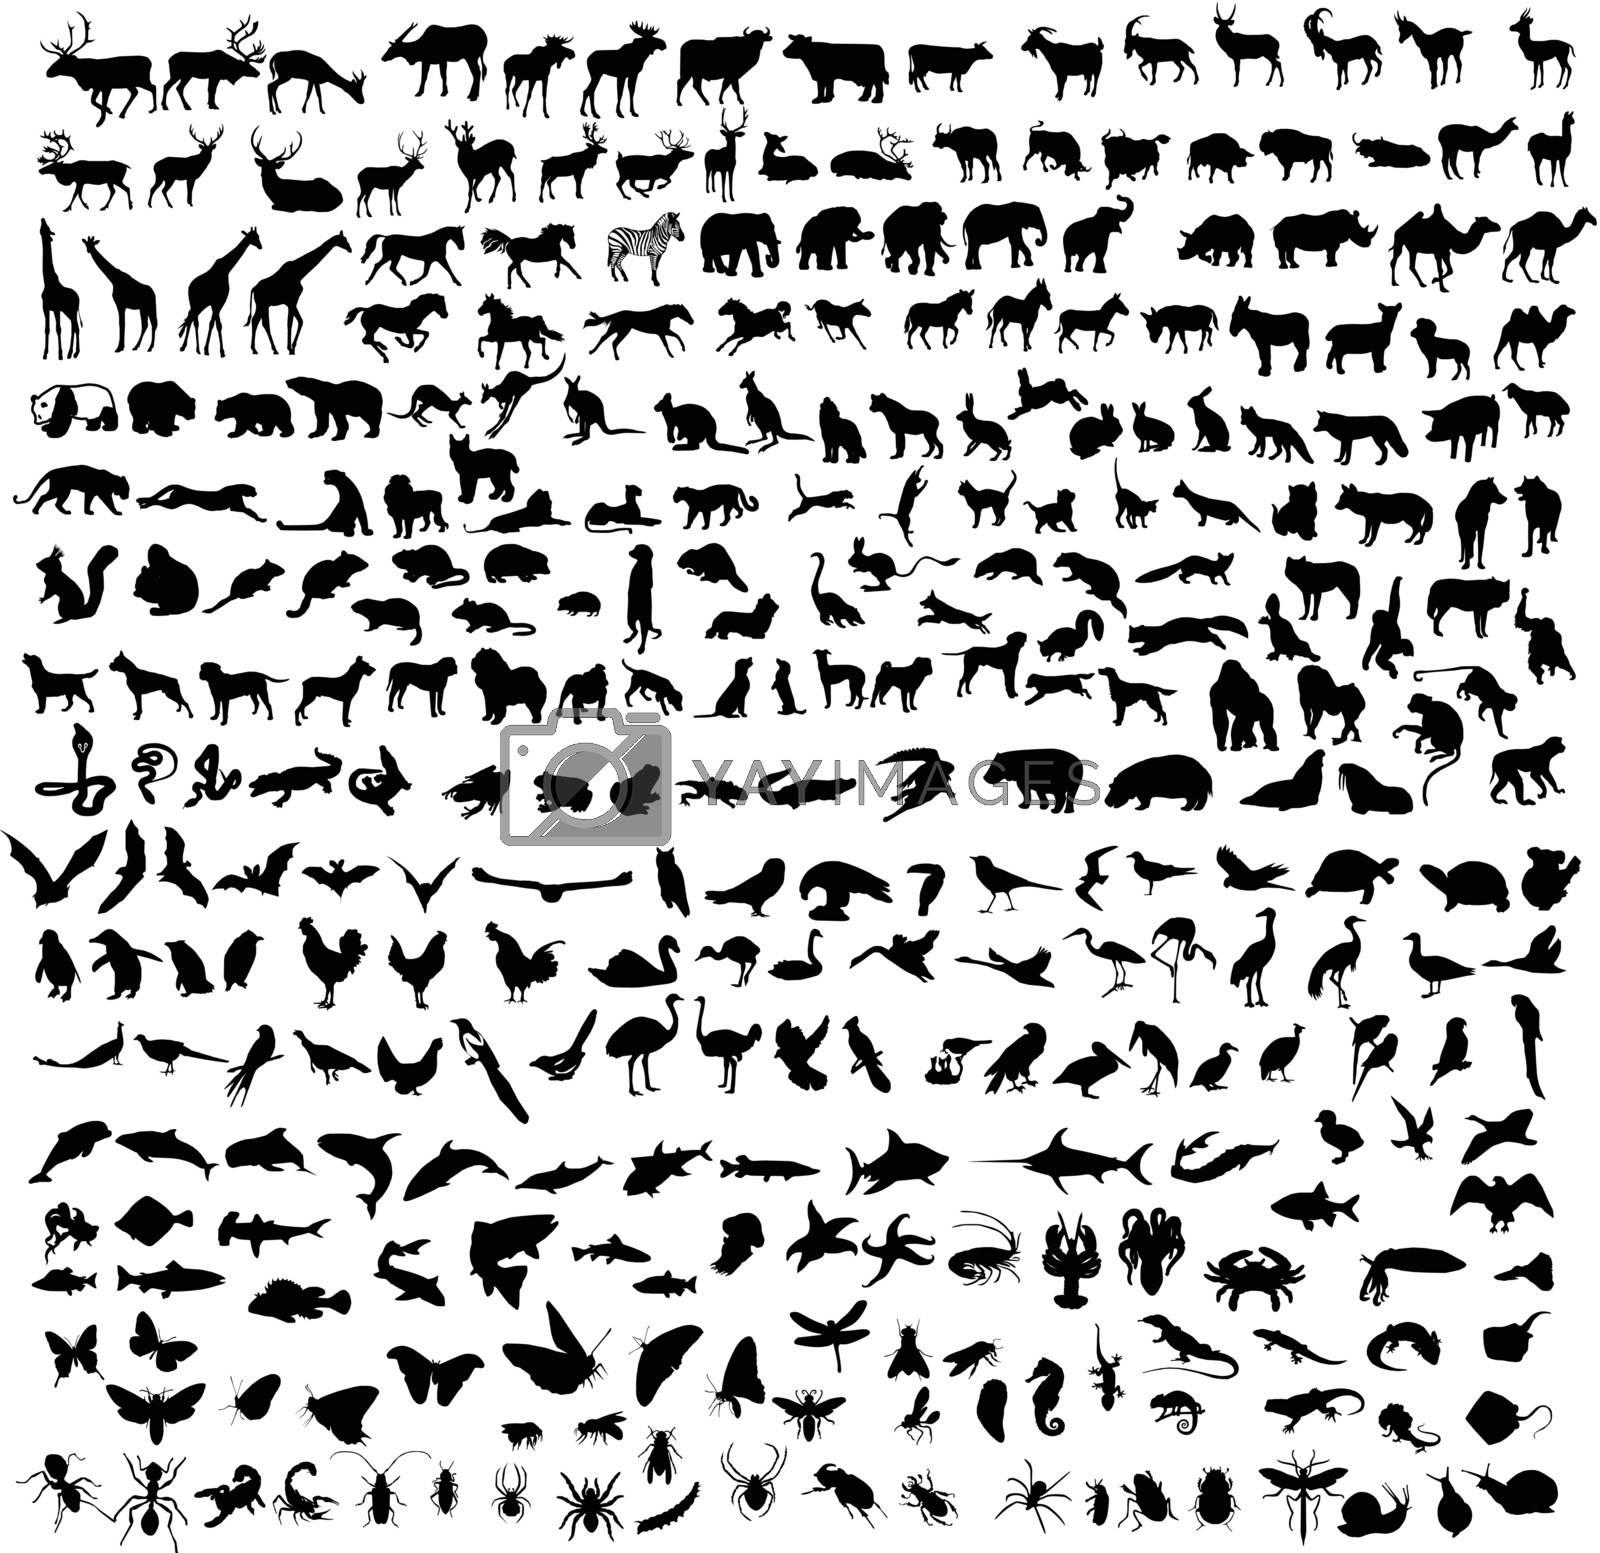 300 black silhouettes of animals